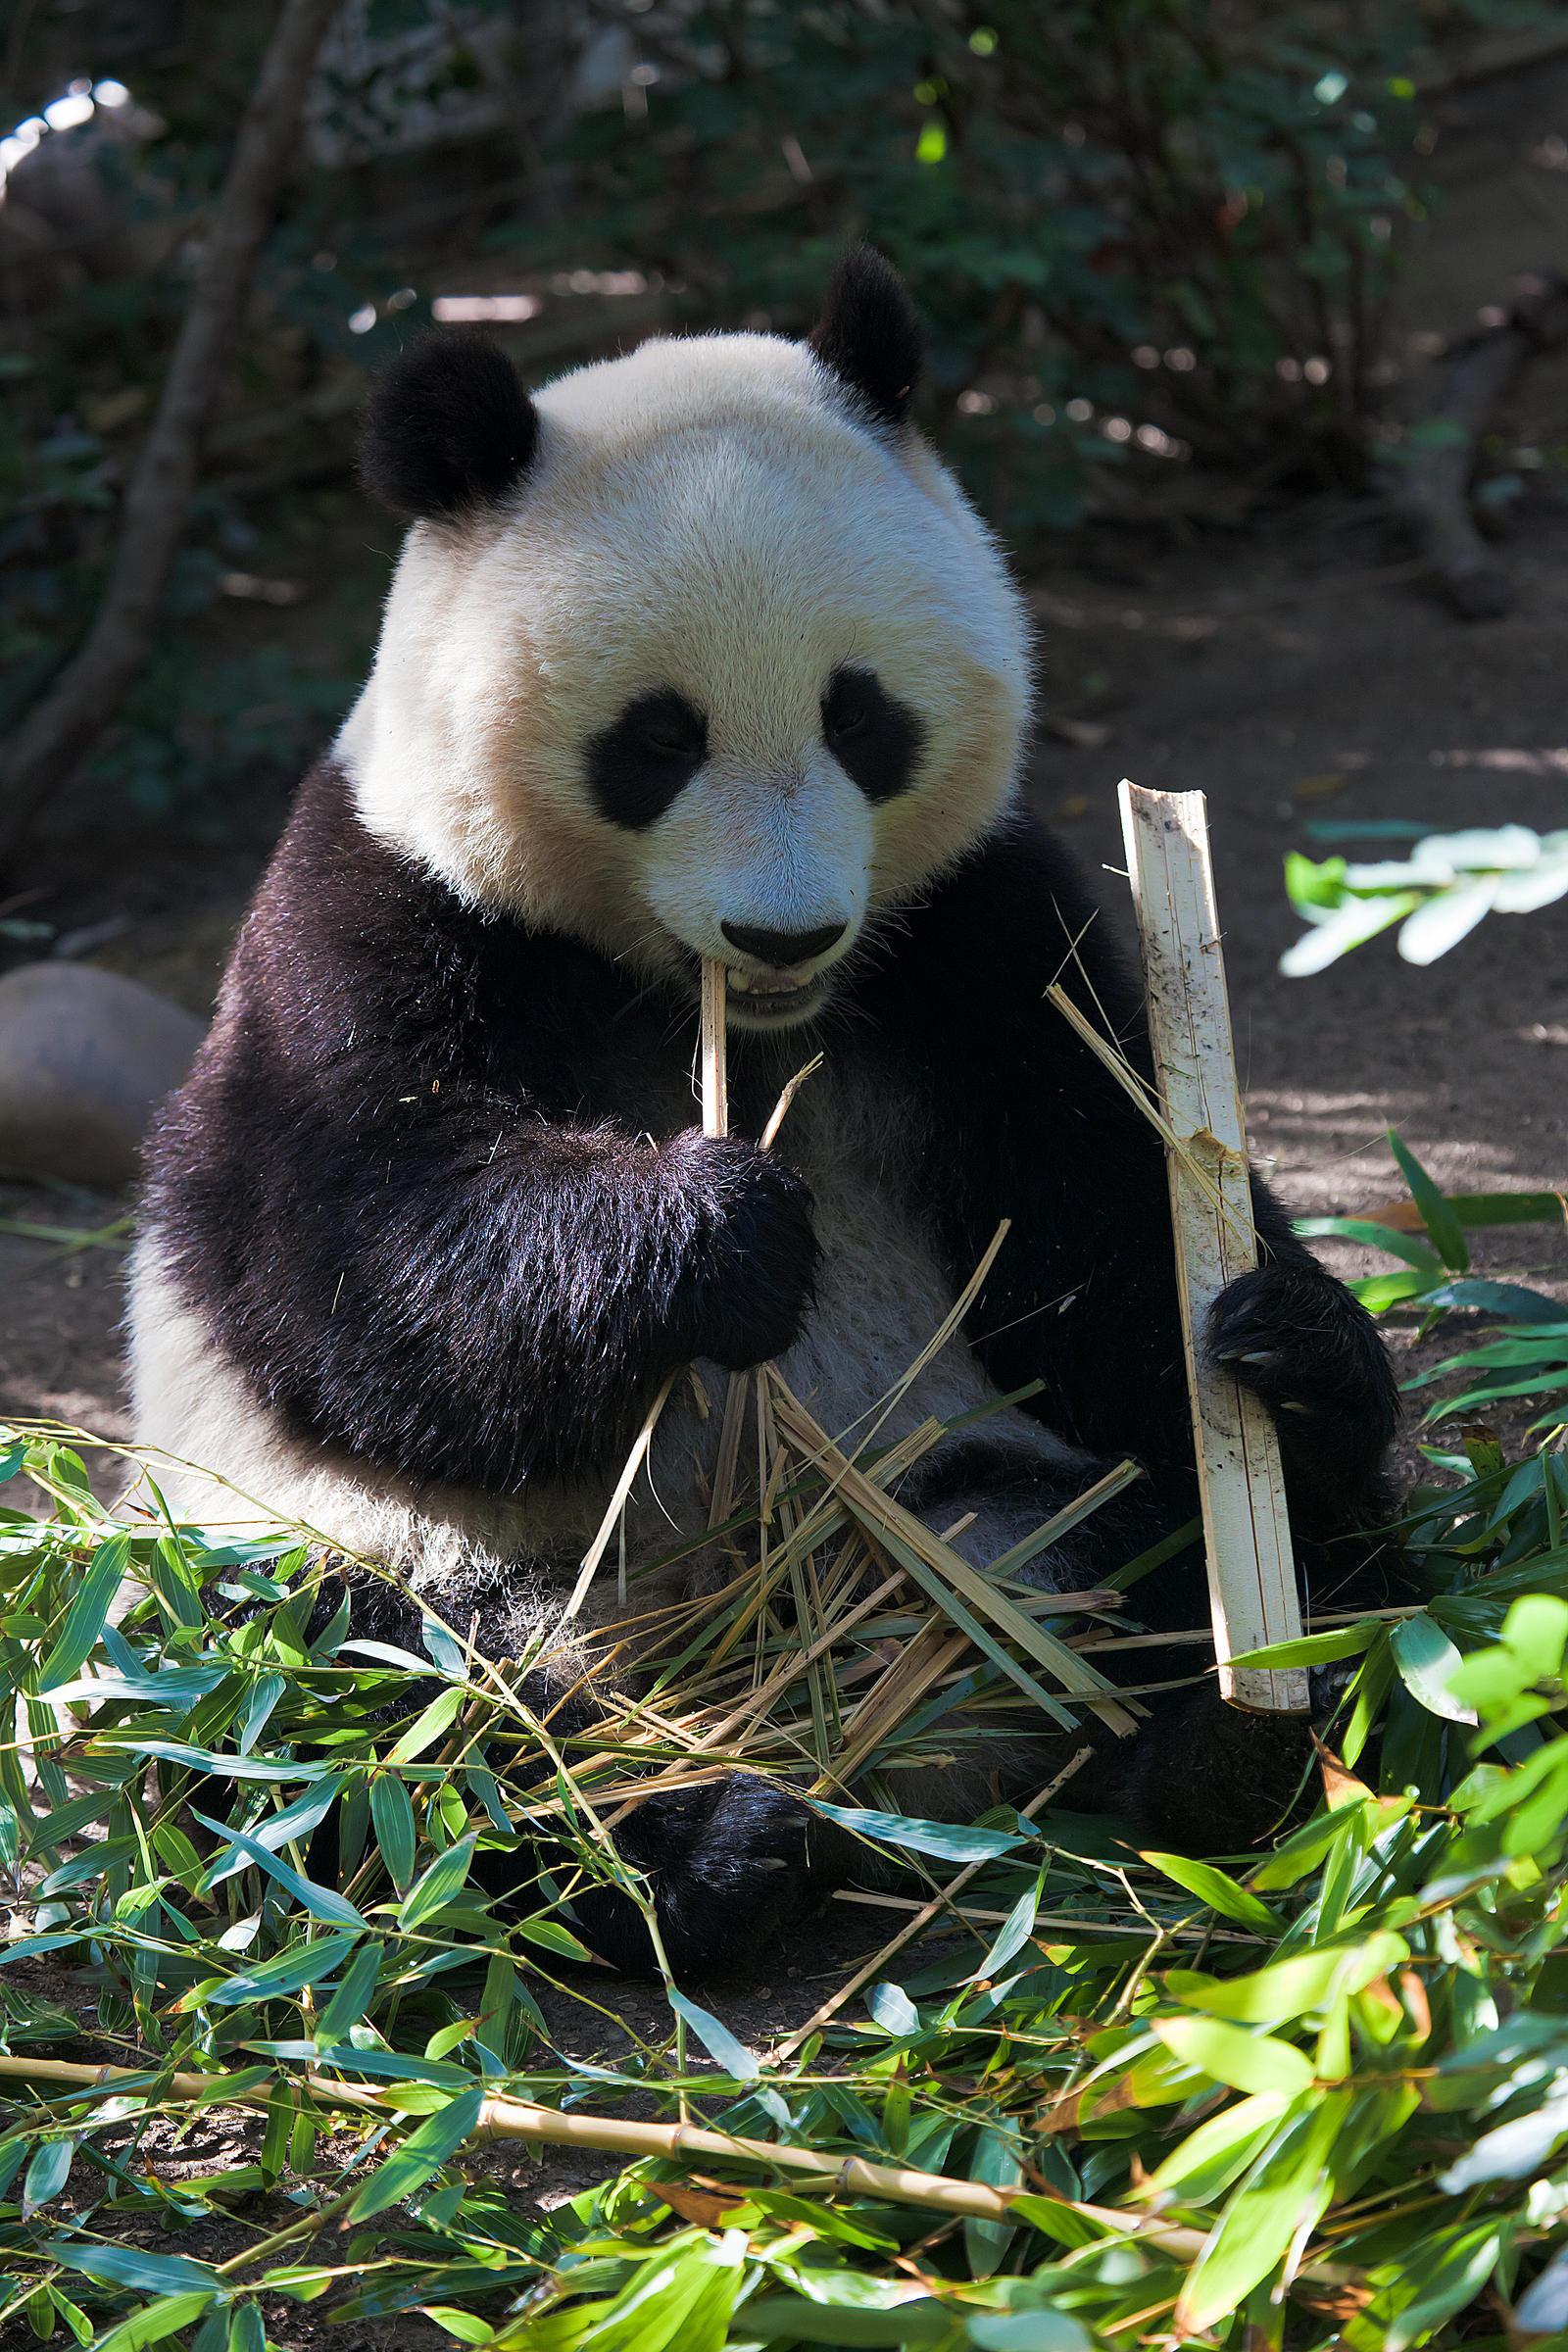 Panda Eating Bamboo ~ Panda eating bamboo by dkbarto on deviantart